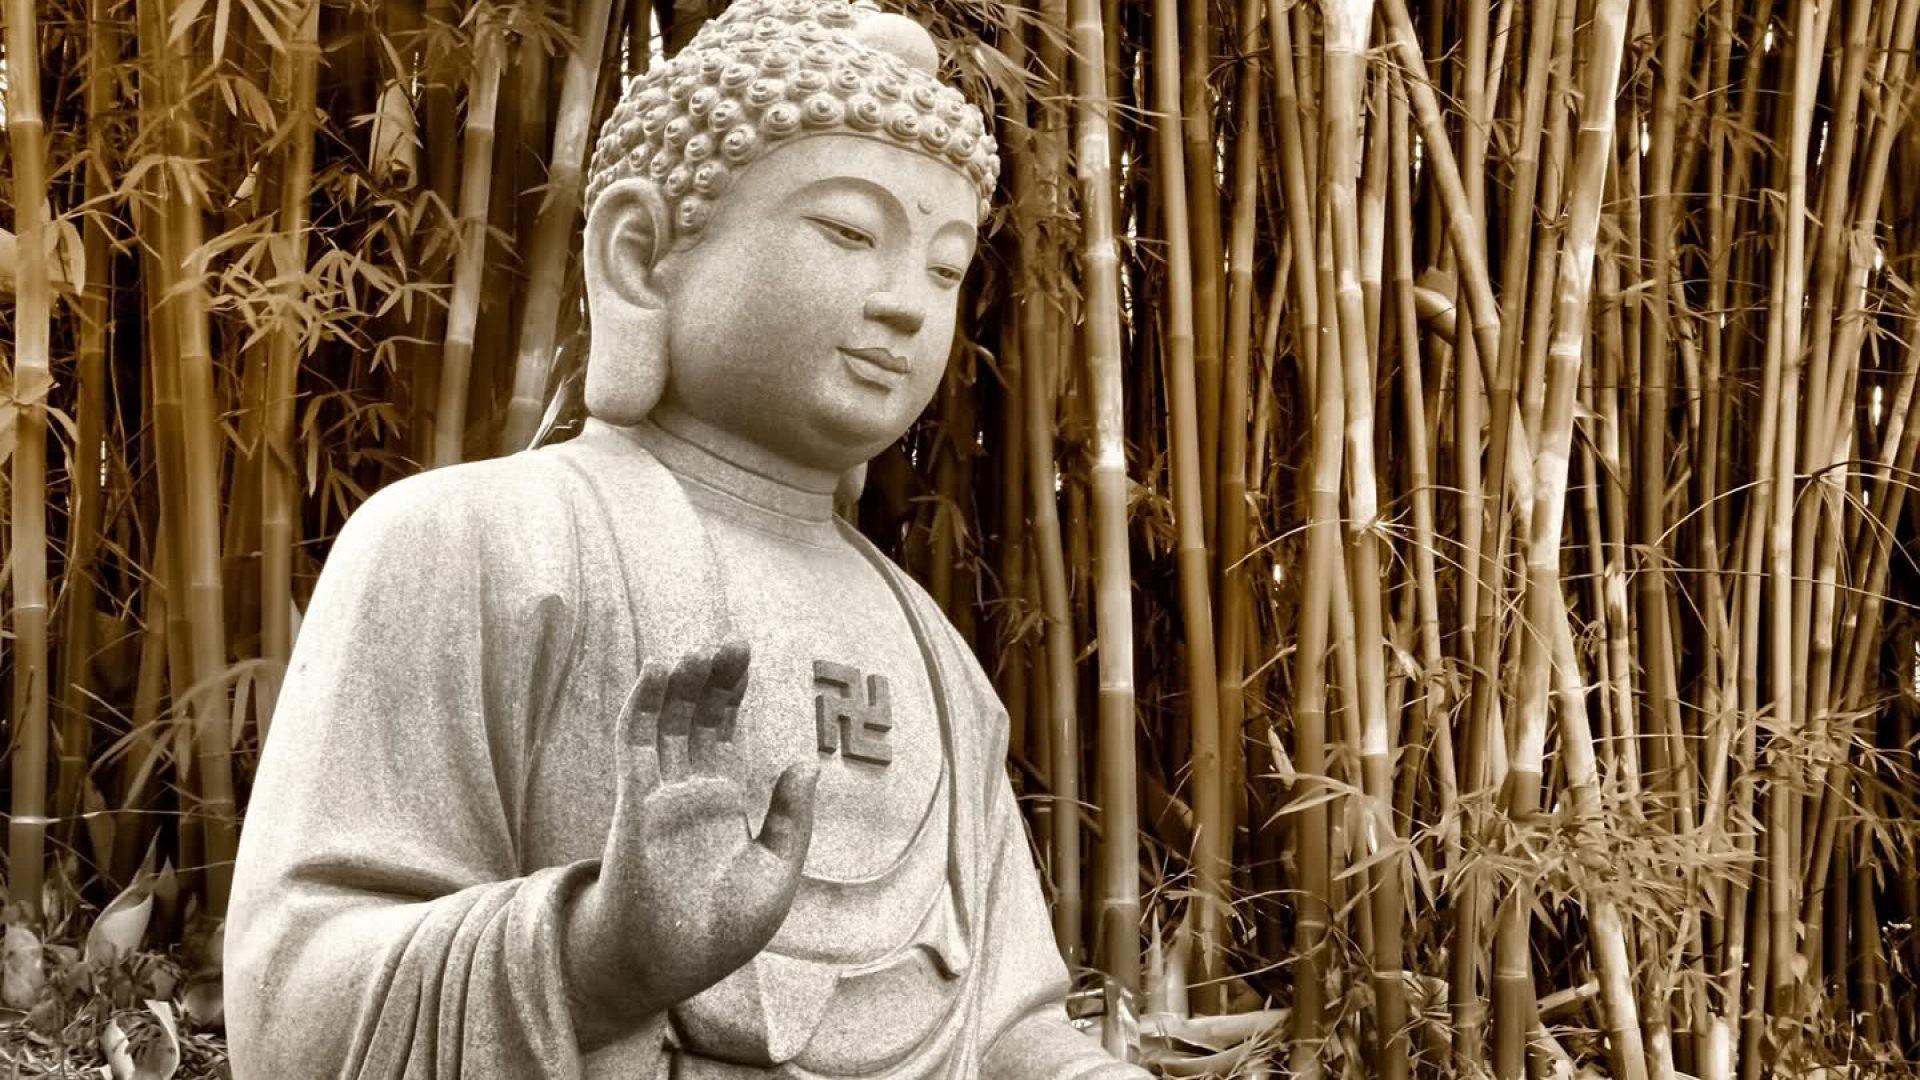 Bhagwan Buddha Images